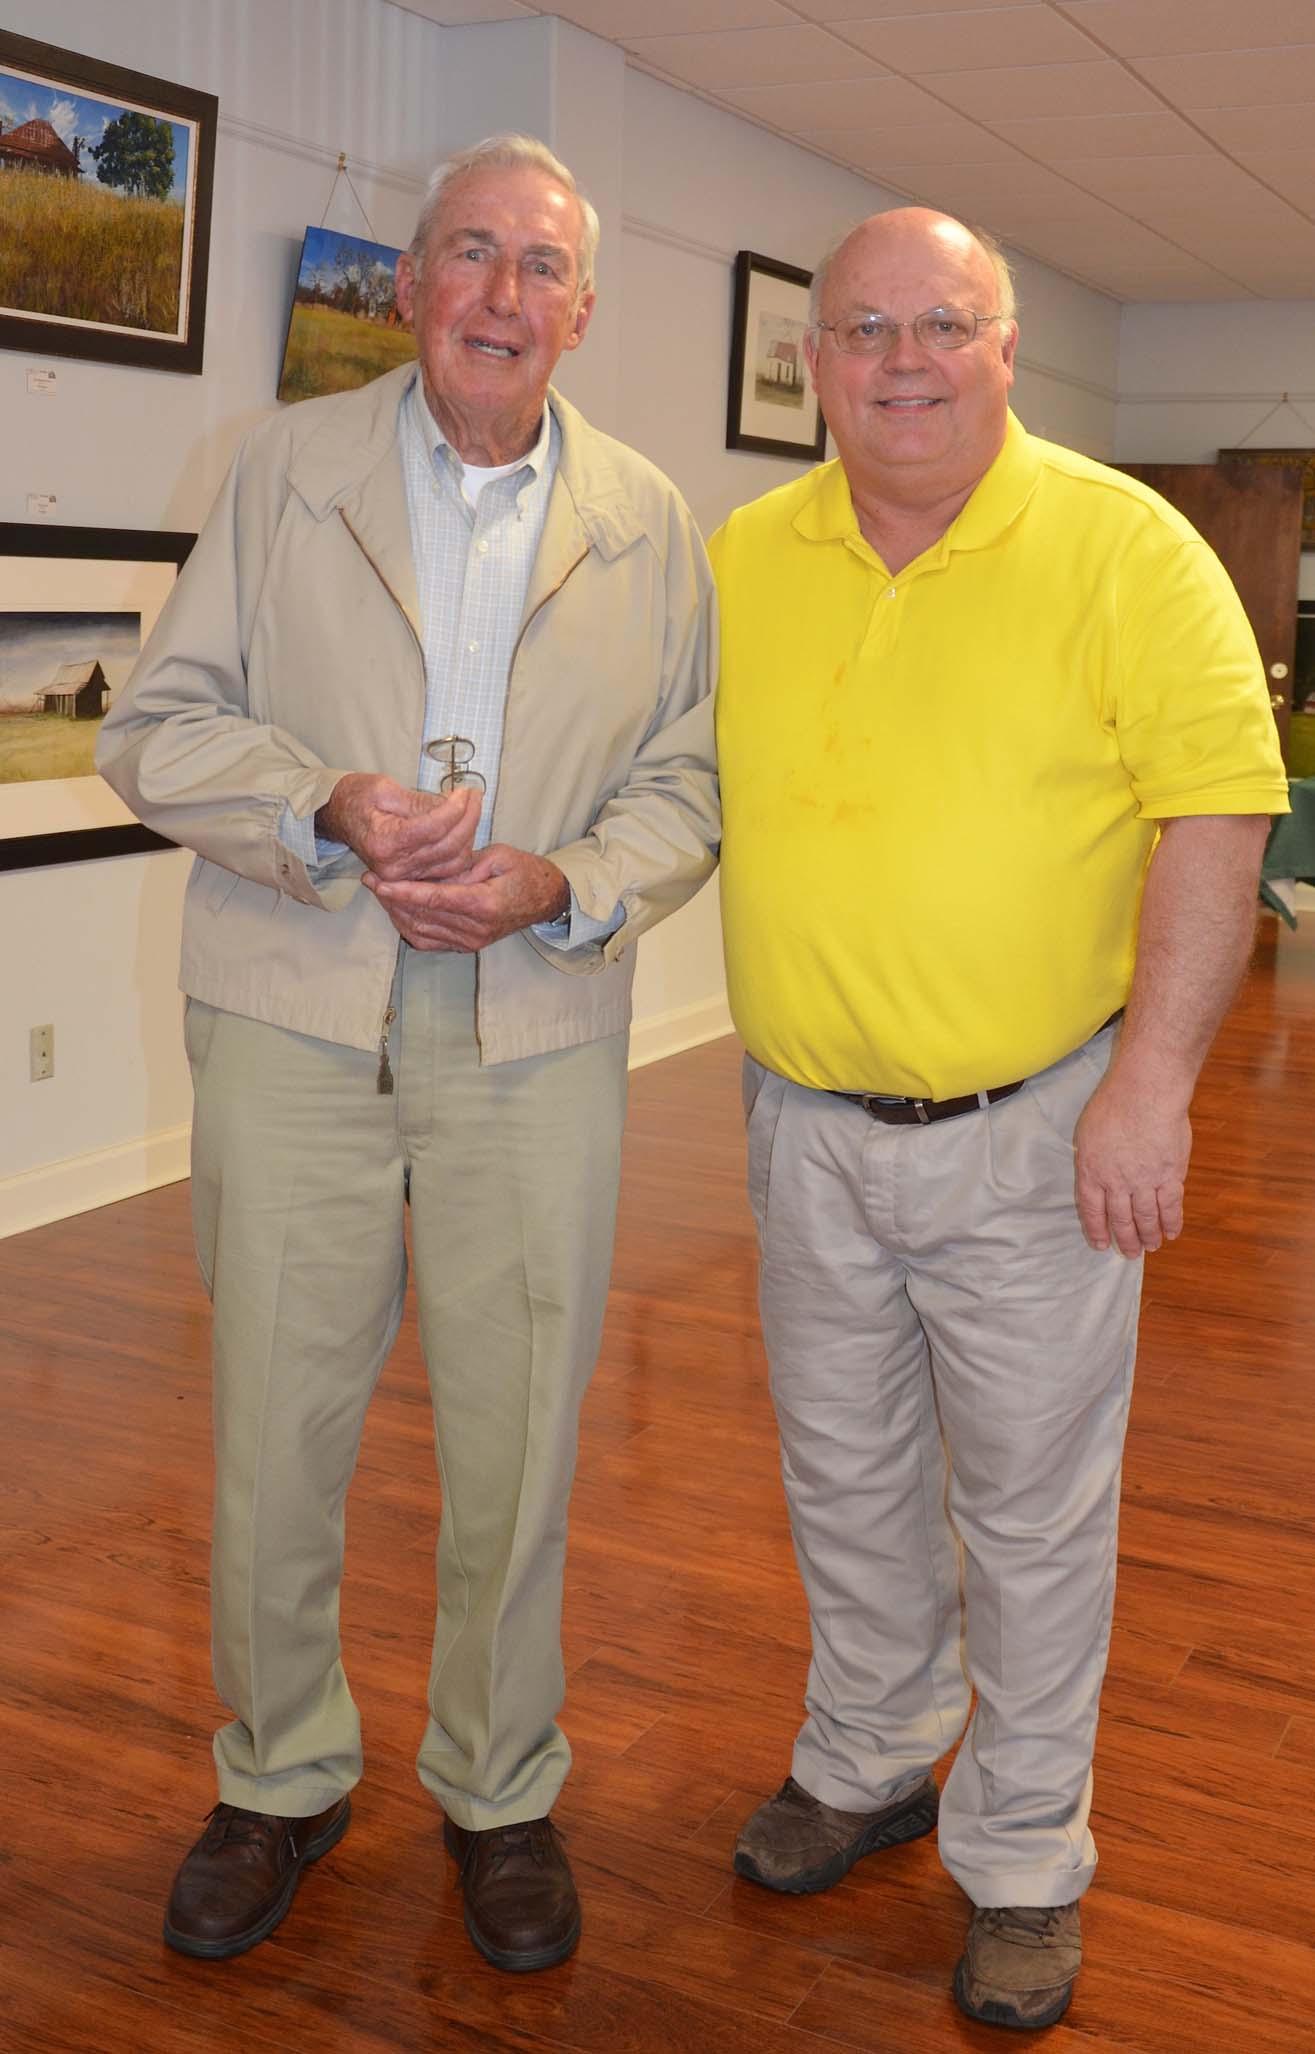 Barry C and Wayne Helms